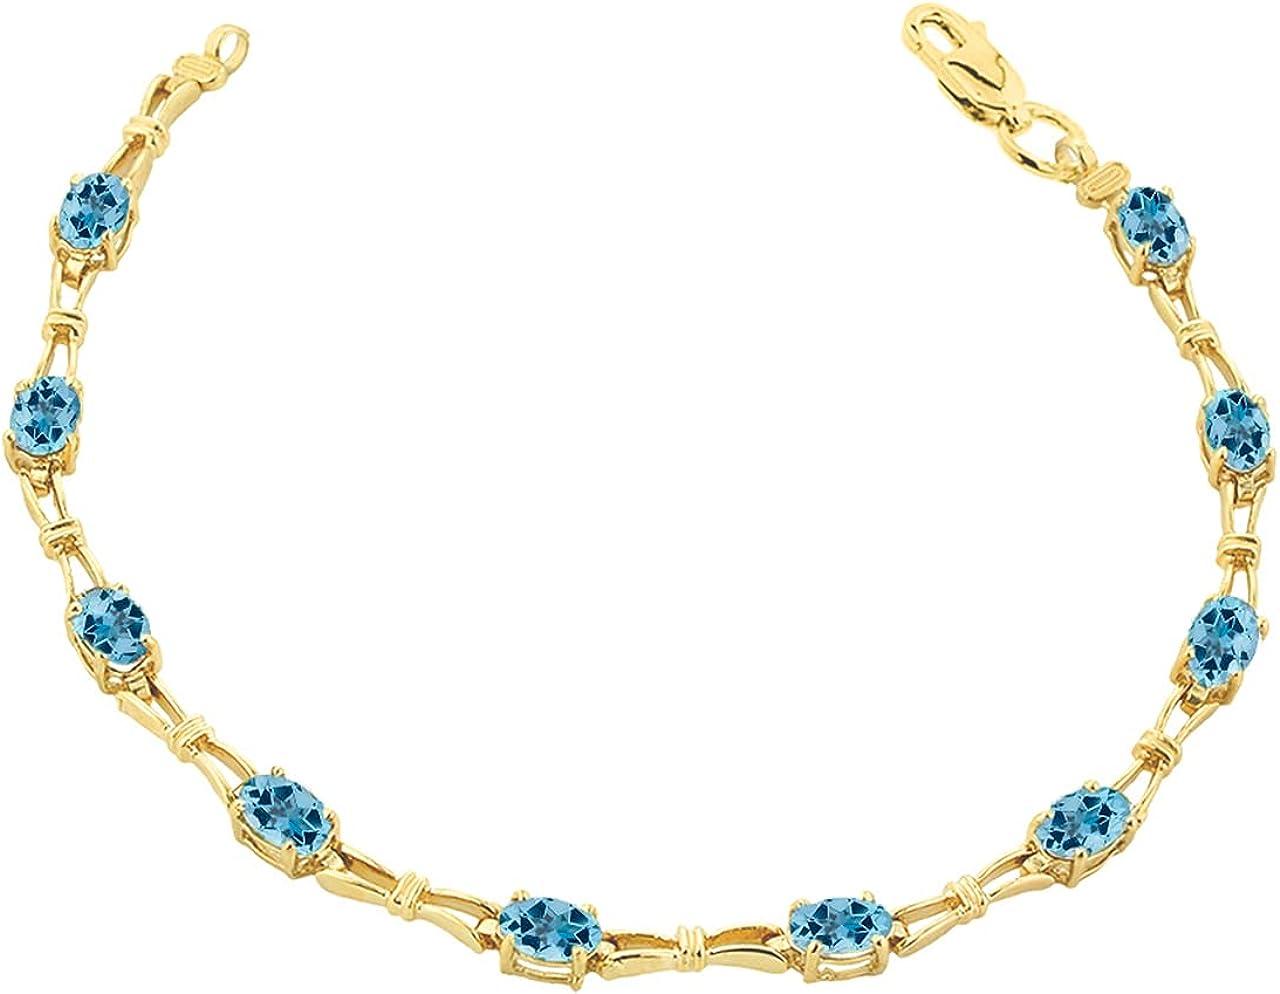 BLUE TOPAZ GEMSTONE TENNIS BRACELET IN YELLOW GOLD - Gold Purity